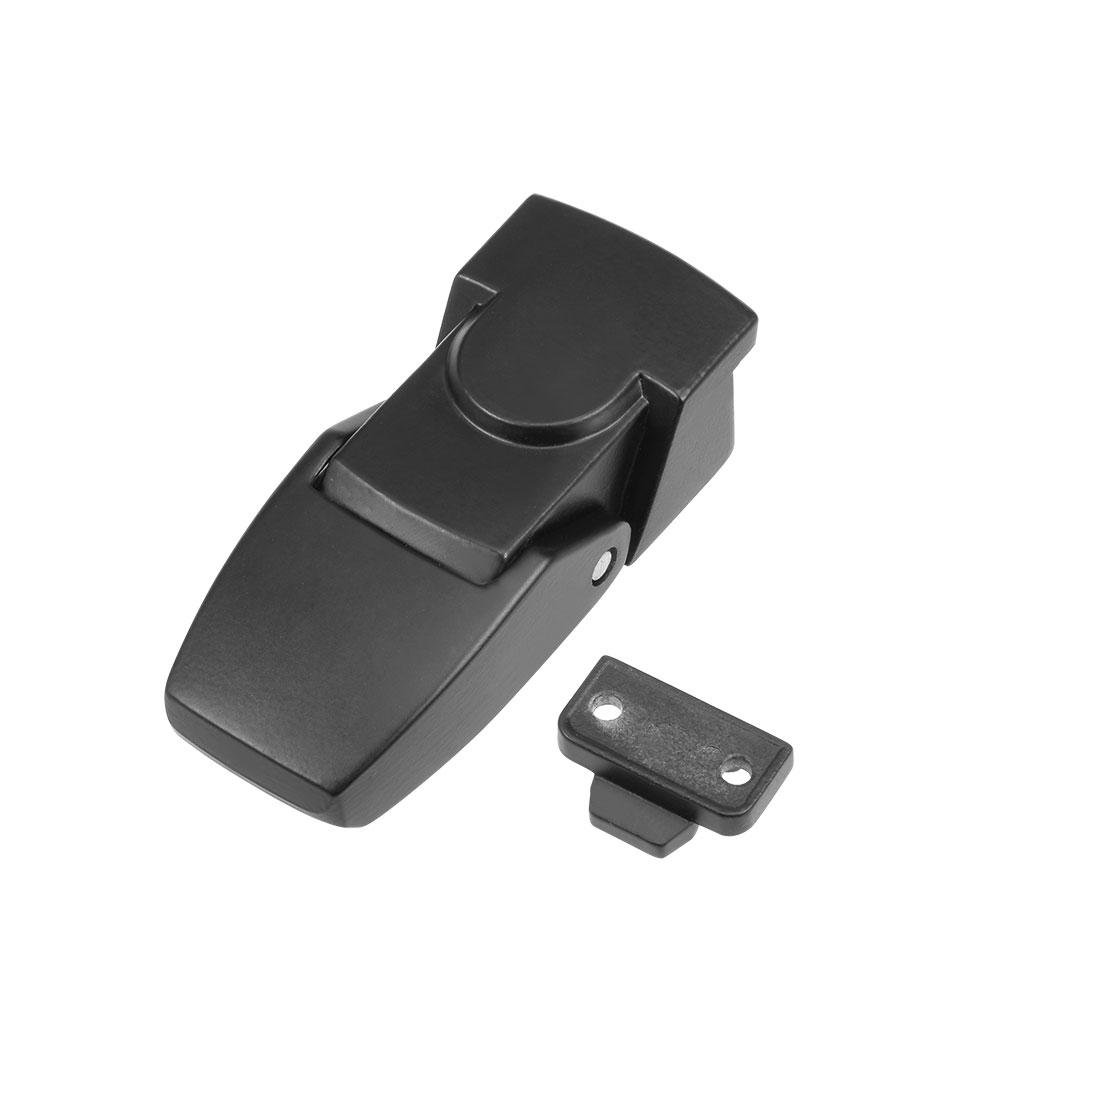 Electric Cabinet Hasp Lock 76mm Long Zinc Alloy Chrome Finish Keyless, Black